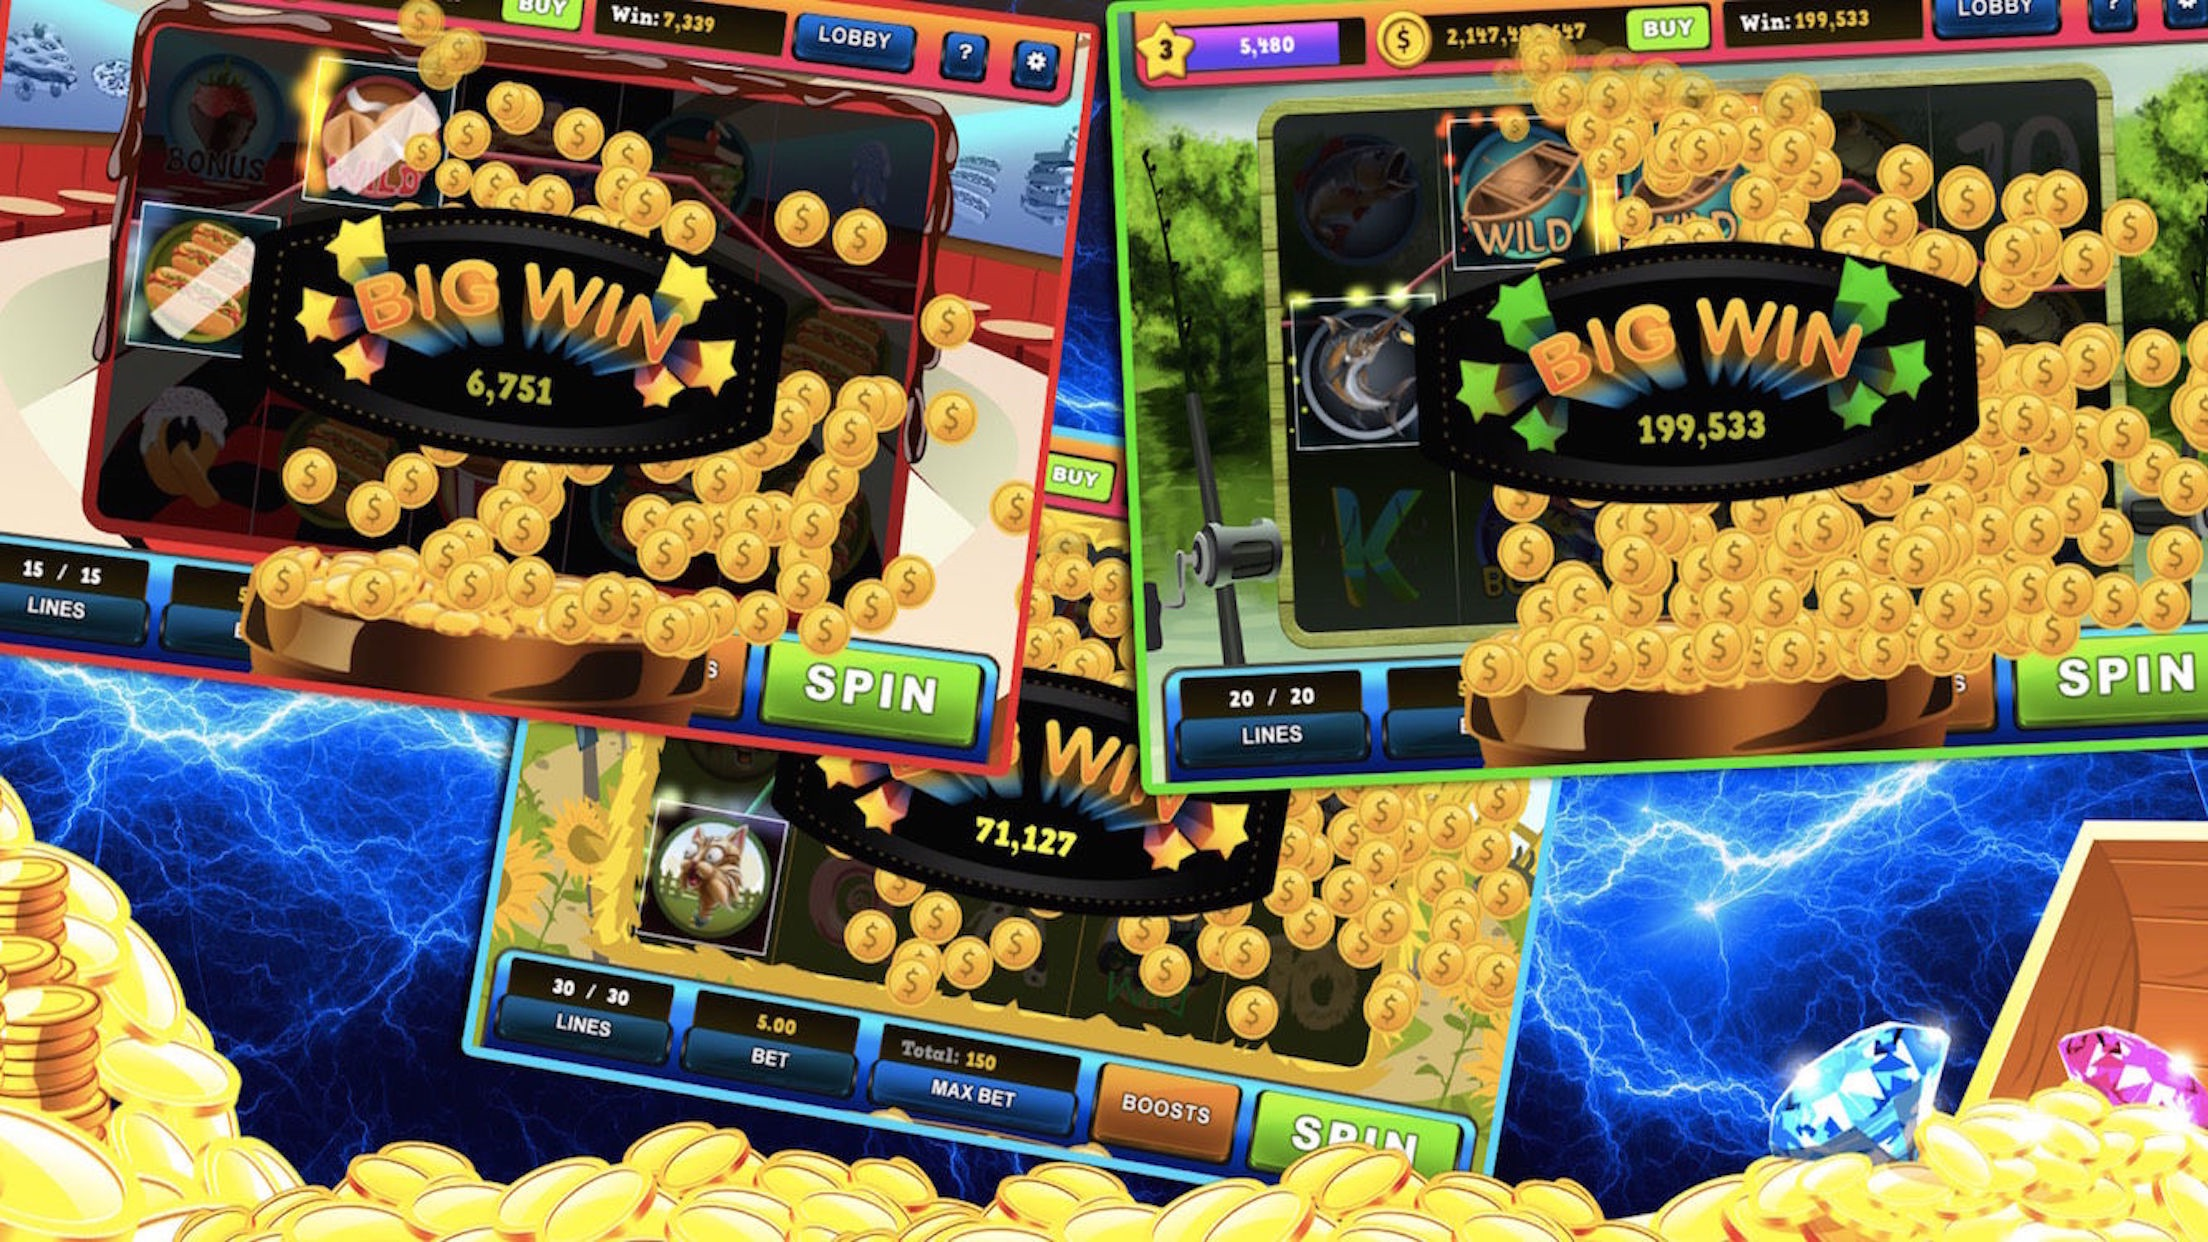 Mega Jackpot Slots - Classy Vegas Style Casino Screenshot